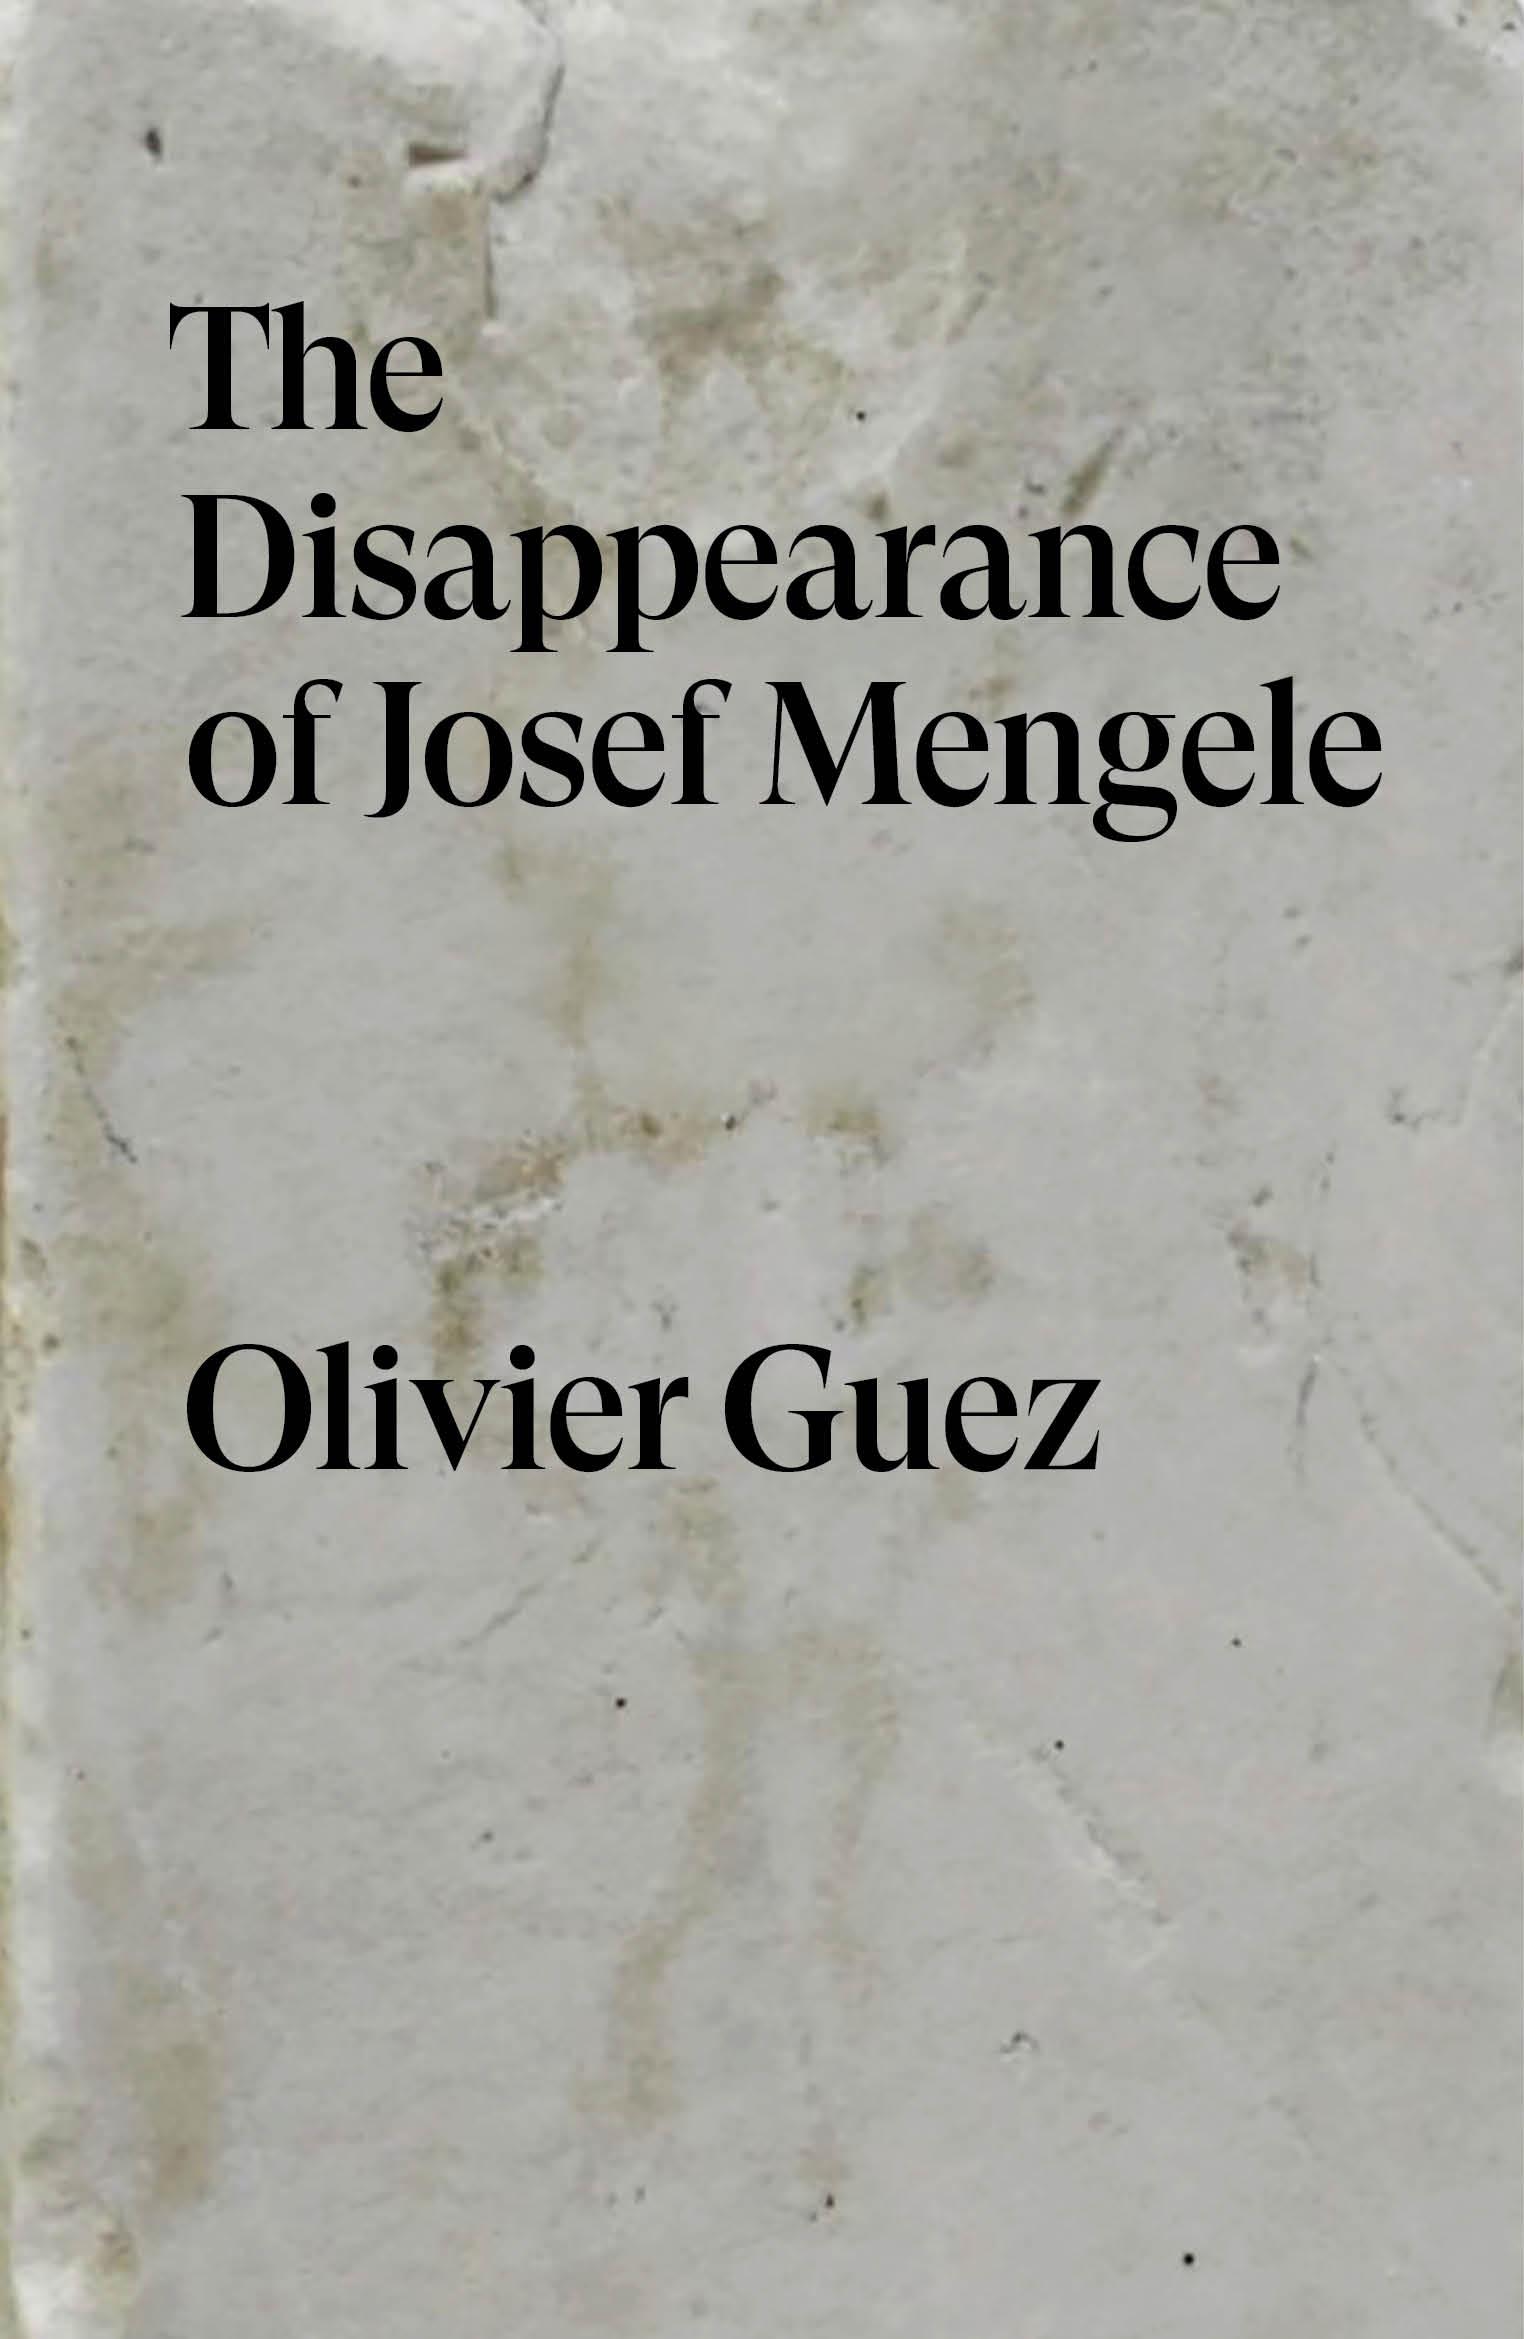 Disappearance_of_josef_mengele_%281%29